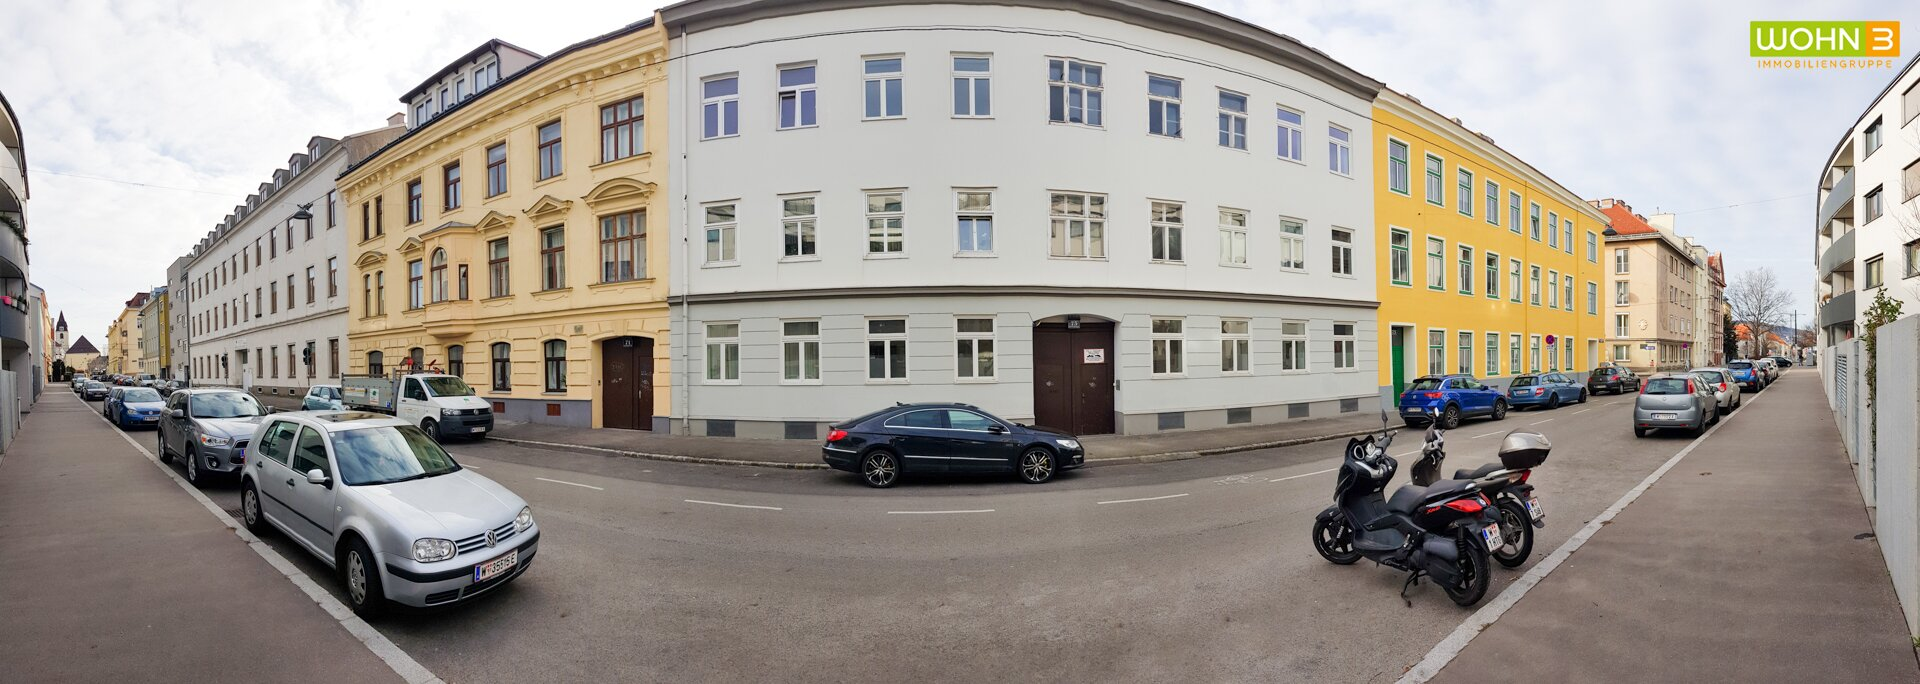 Cumberlandstraße